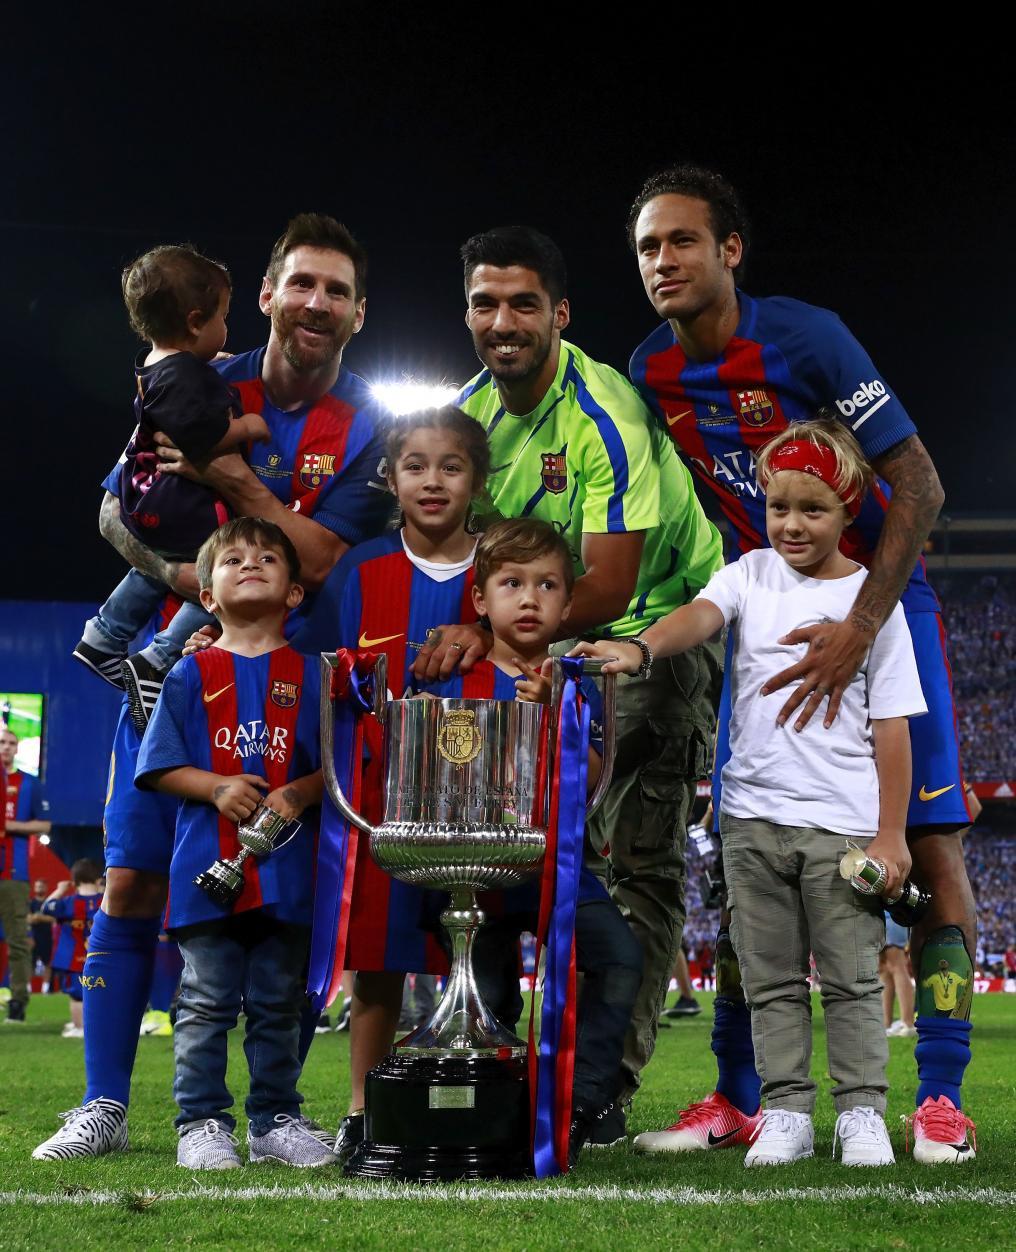 Messi, Suarez, Neymar, and their kids